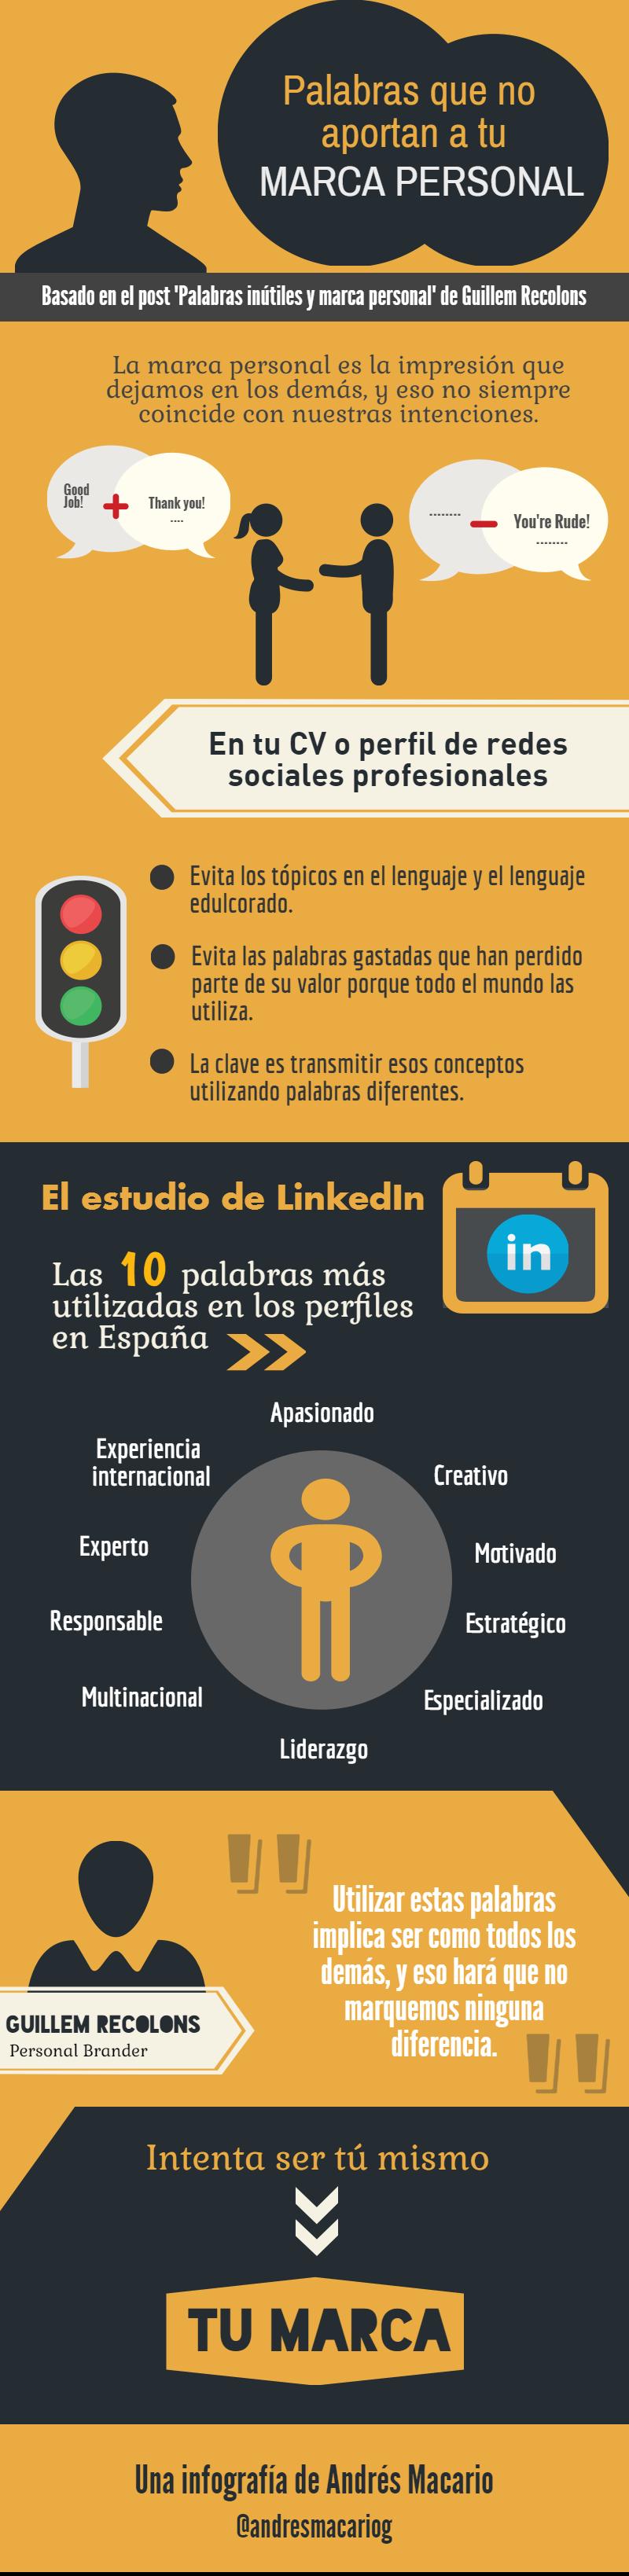 palabras que no aportan. Infografía by Andrés Macario basada en un texto de Guillem Recolons